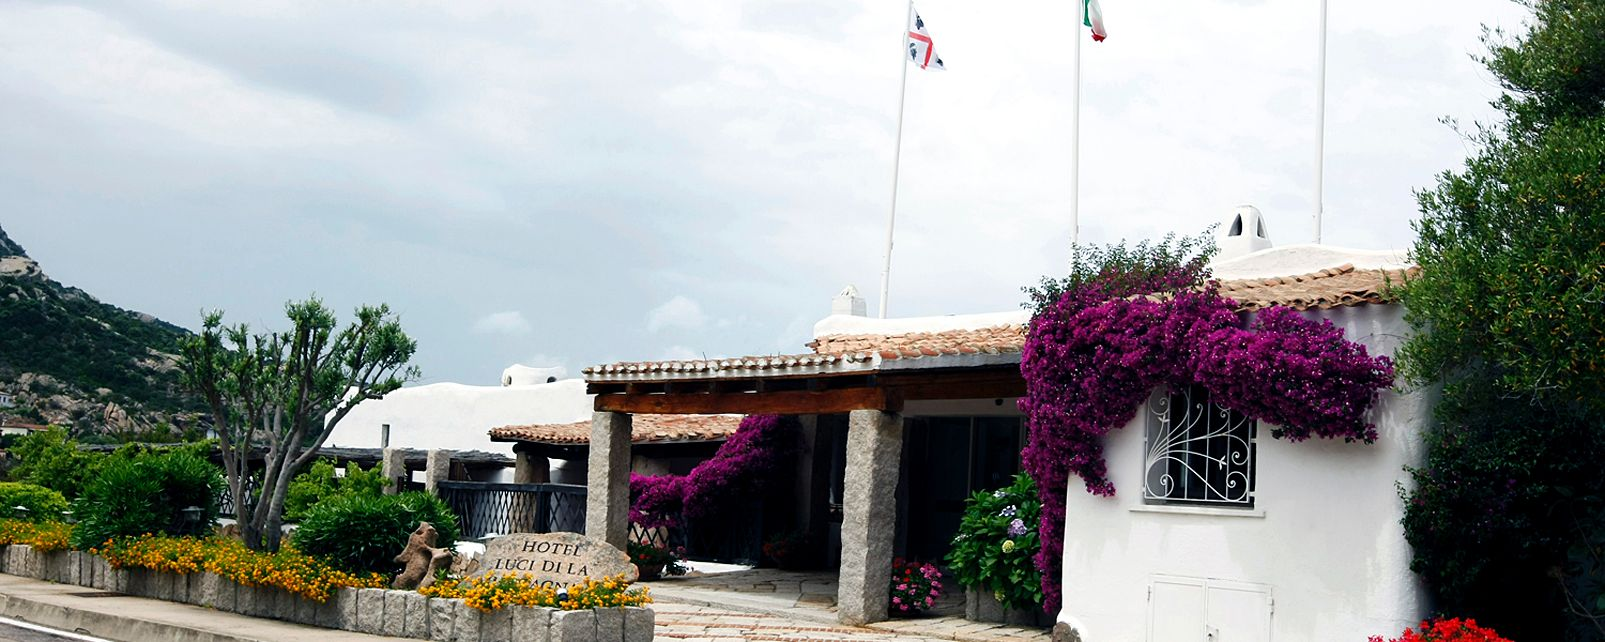 Hôtel Luci di la Muntagna